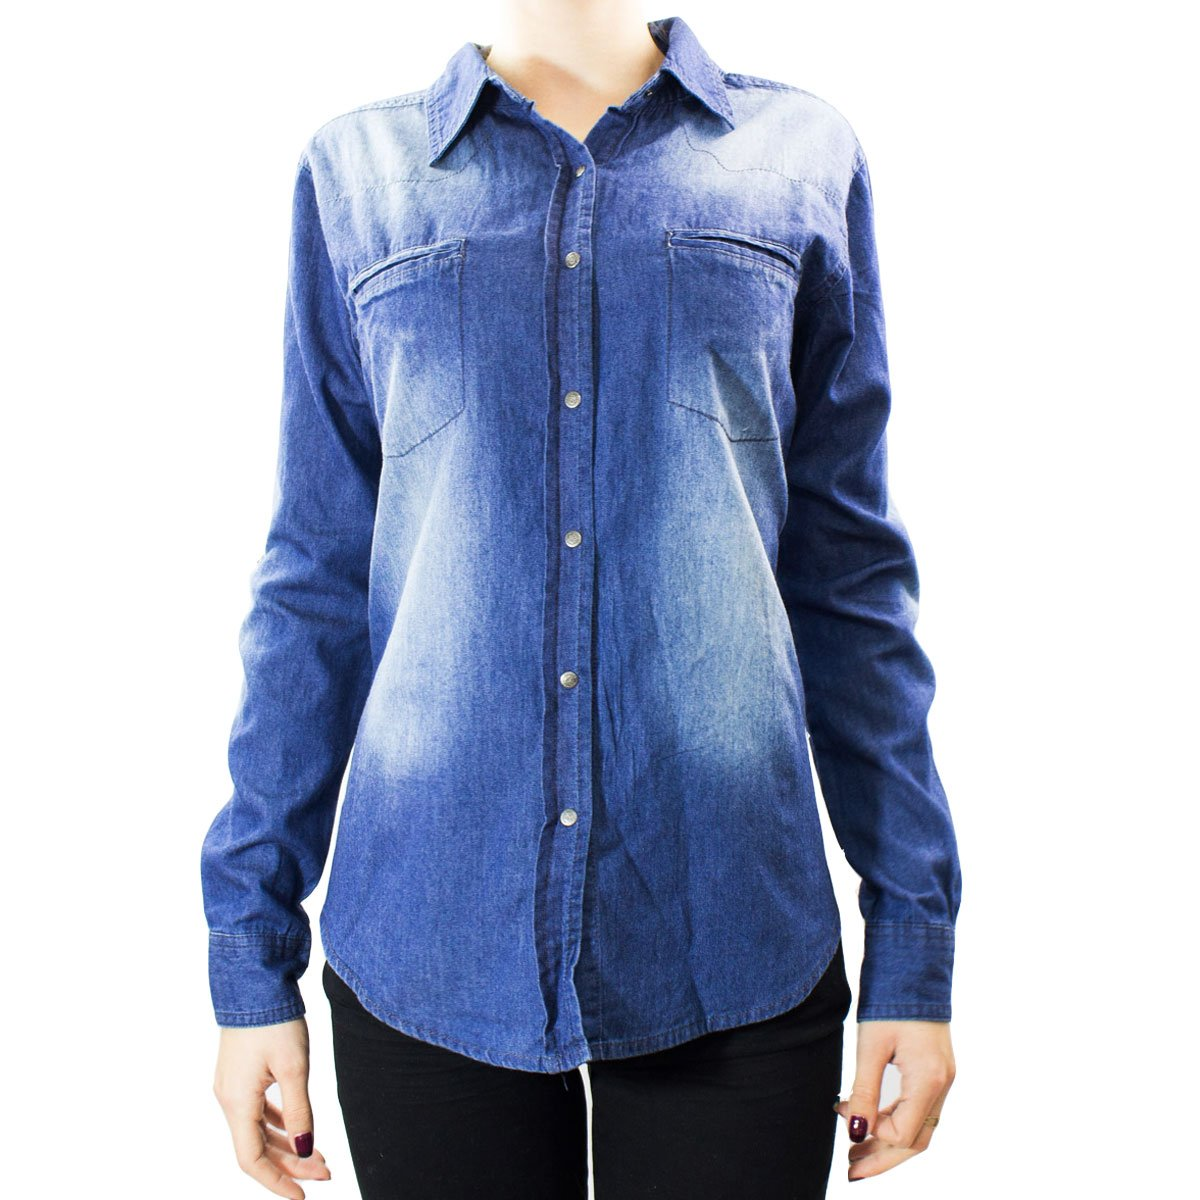 80a3334b57 Bizz Store - Camisa Jeans Feminina Mosaico Manga Longa